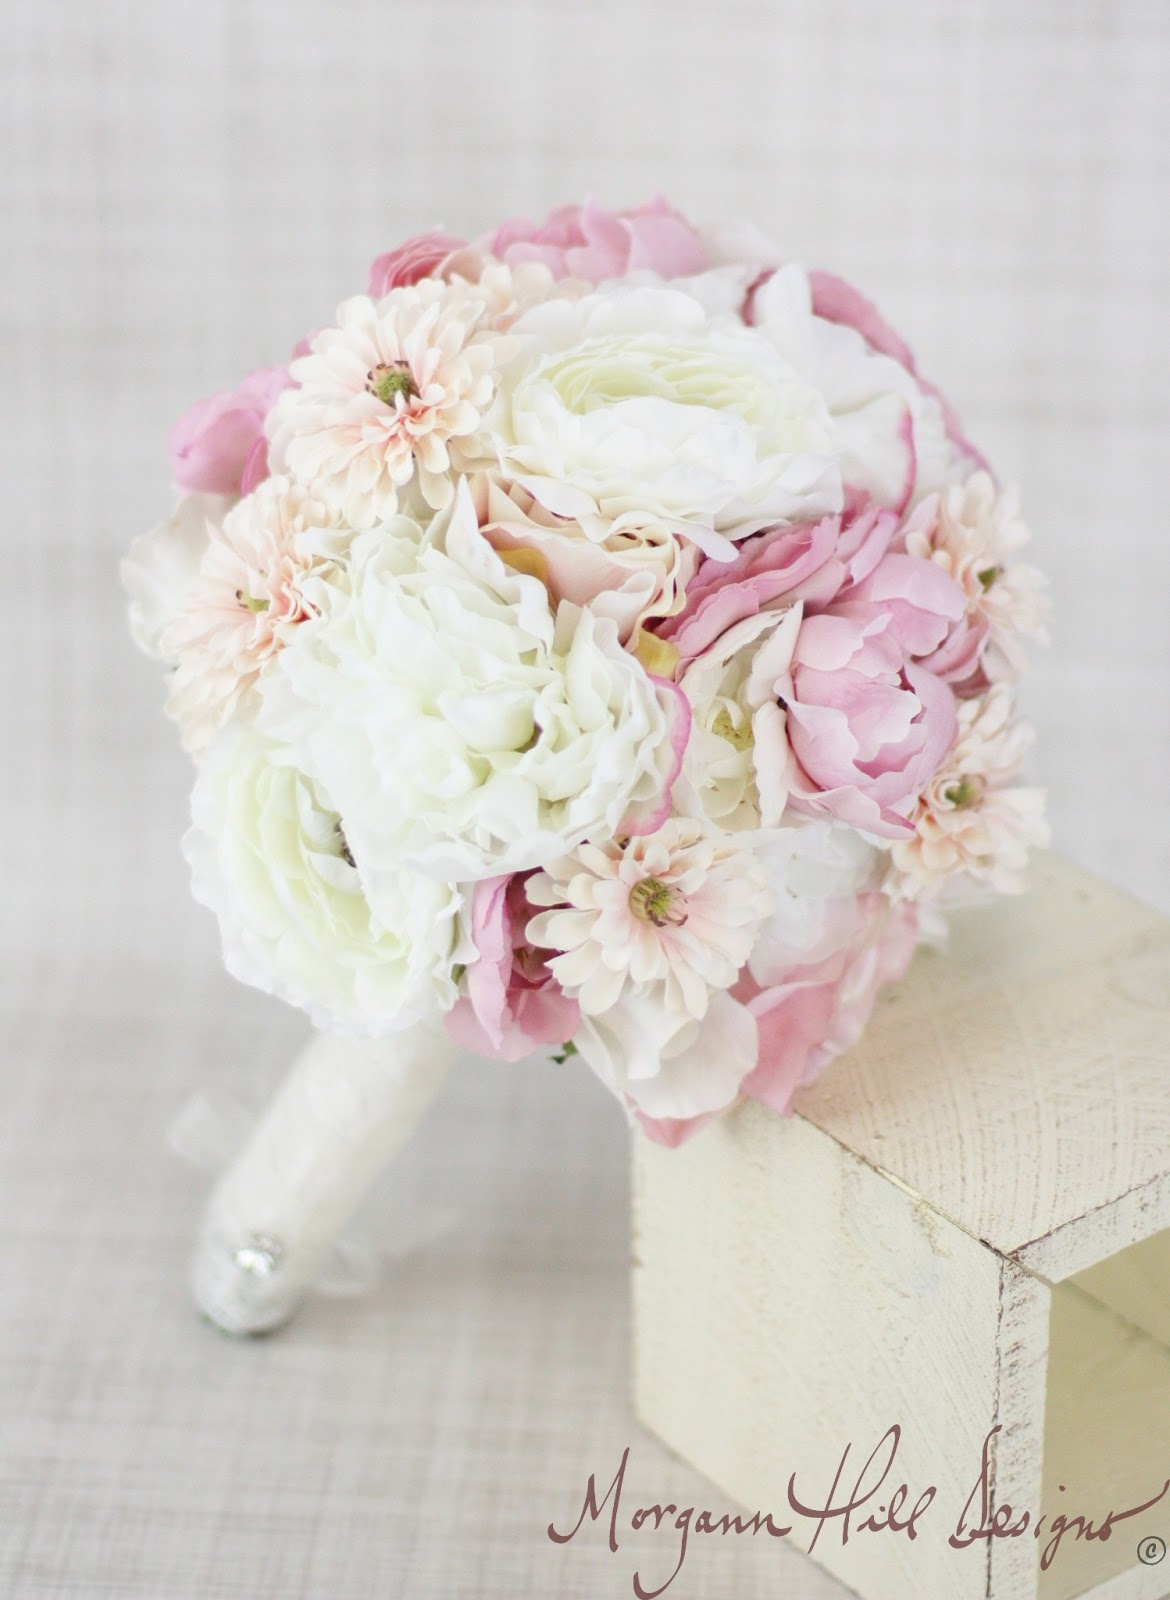 Morgann Hill Designs Silk Bride Bouquet Peony Peonies Roses Ranunculus Daisi